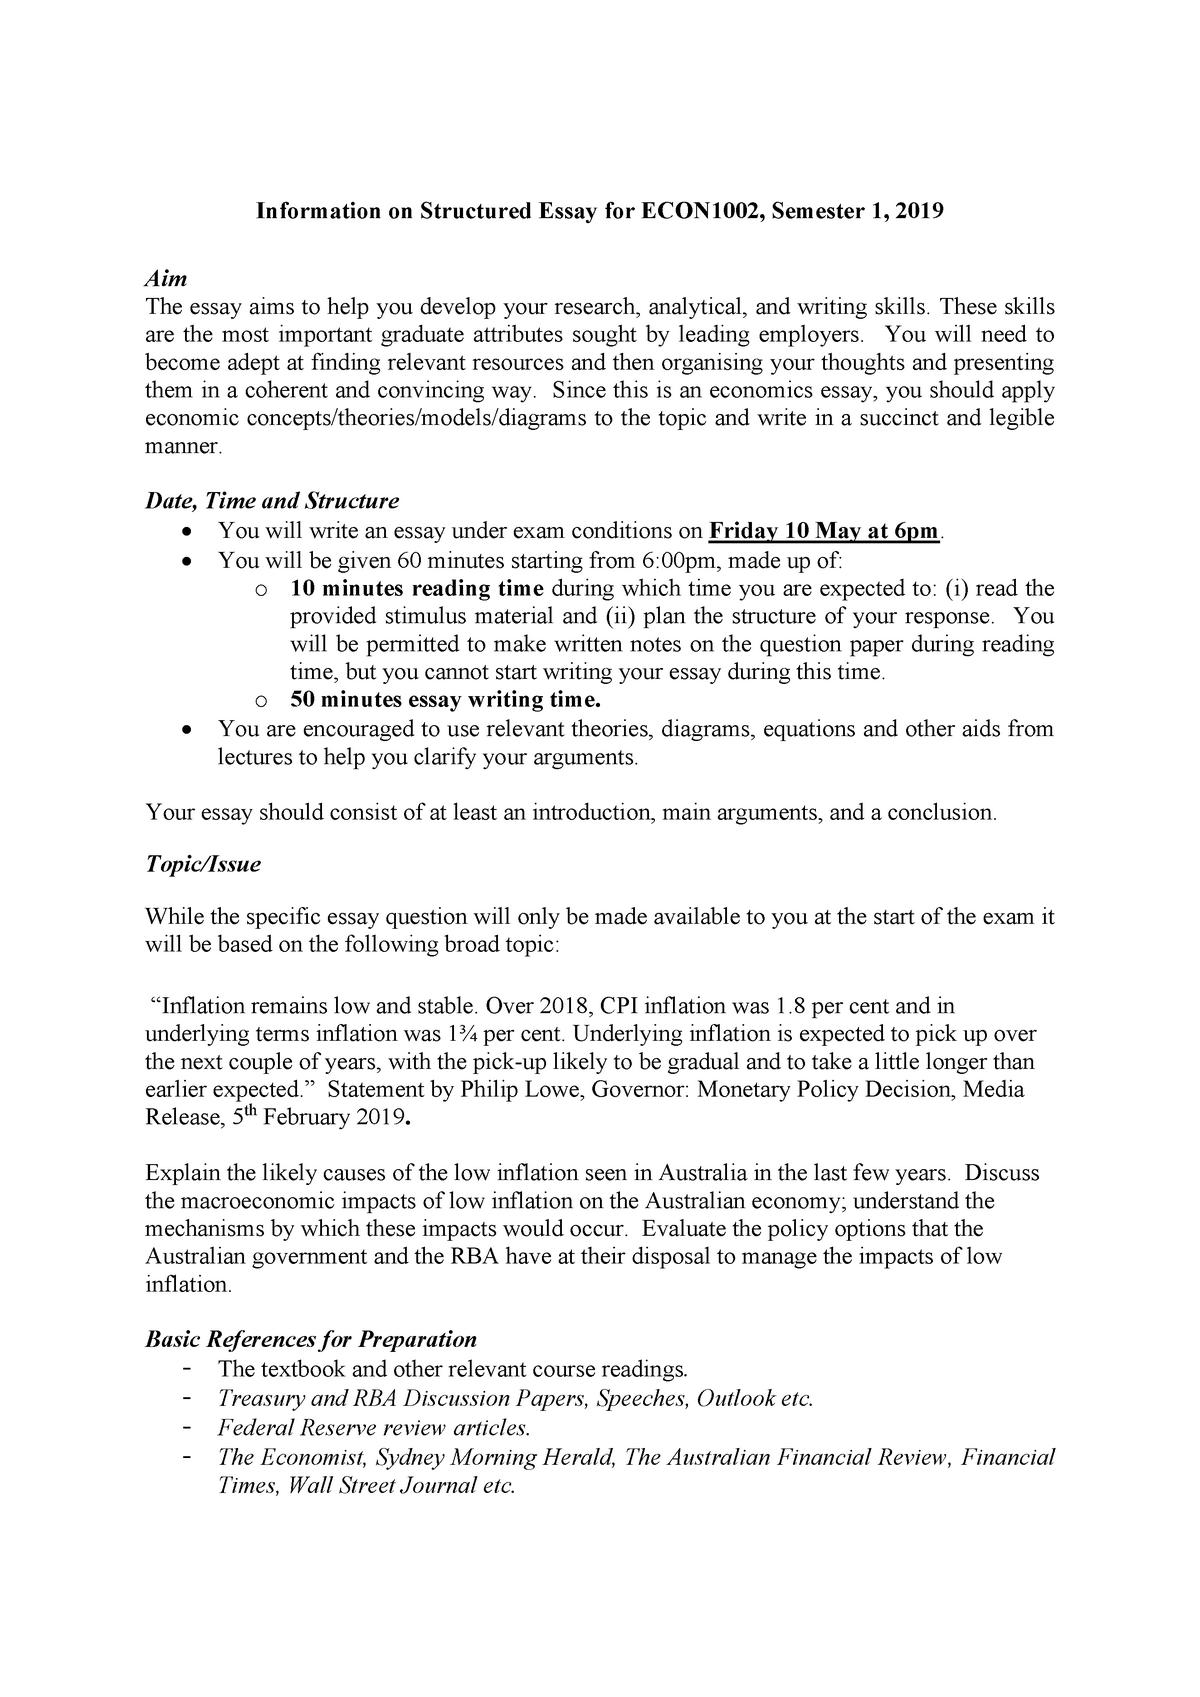 Information on Structured Essay Sem 1 2019 - ECON1002 - USyd